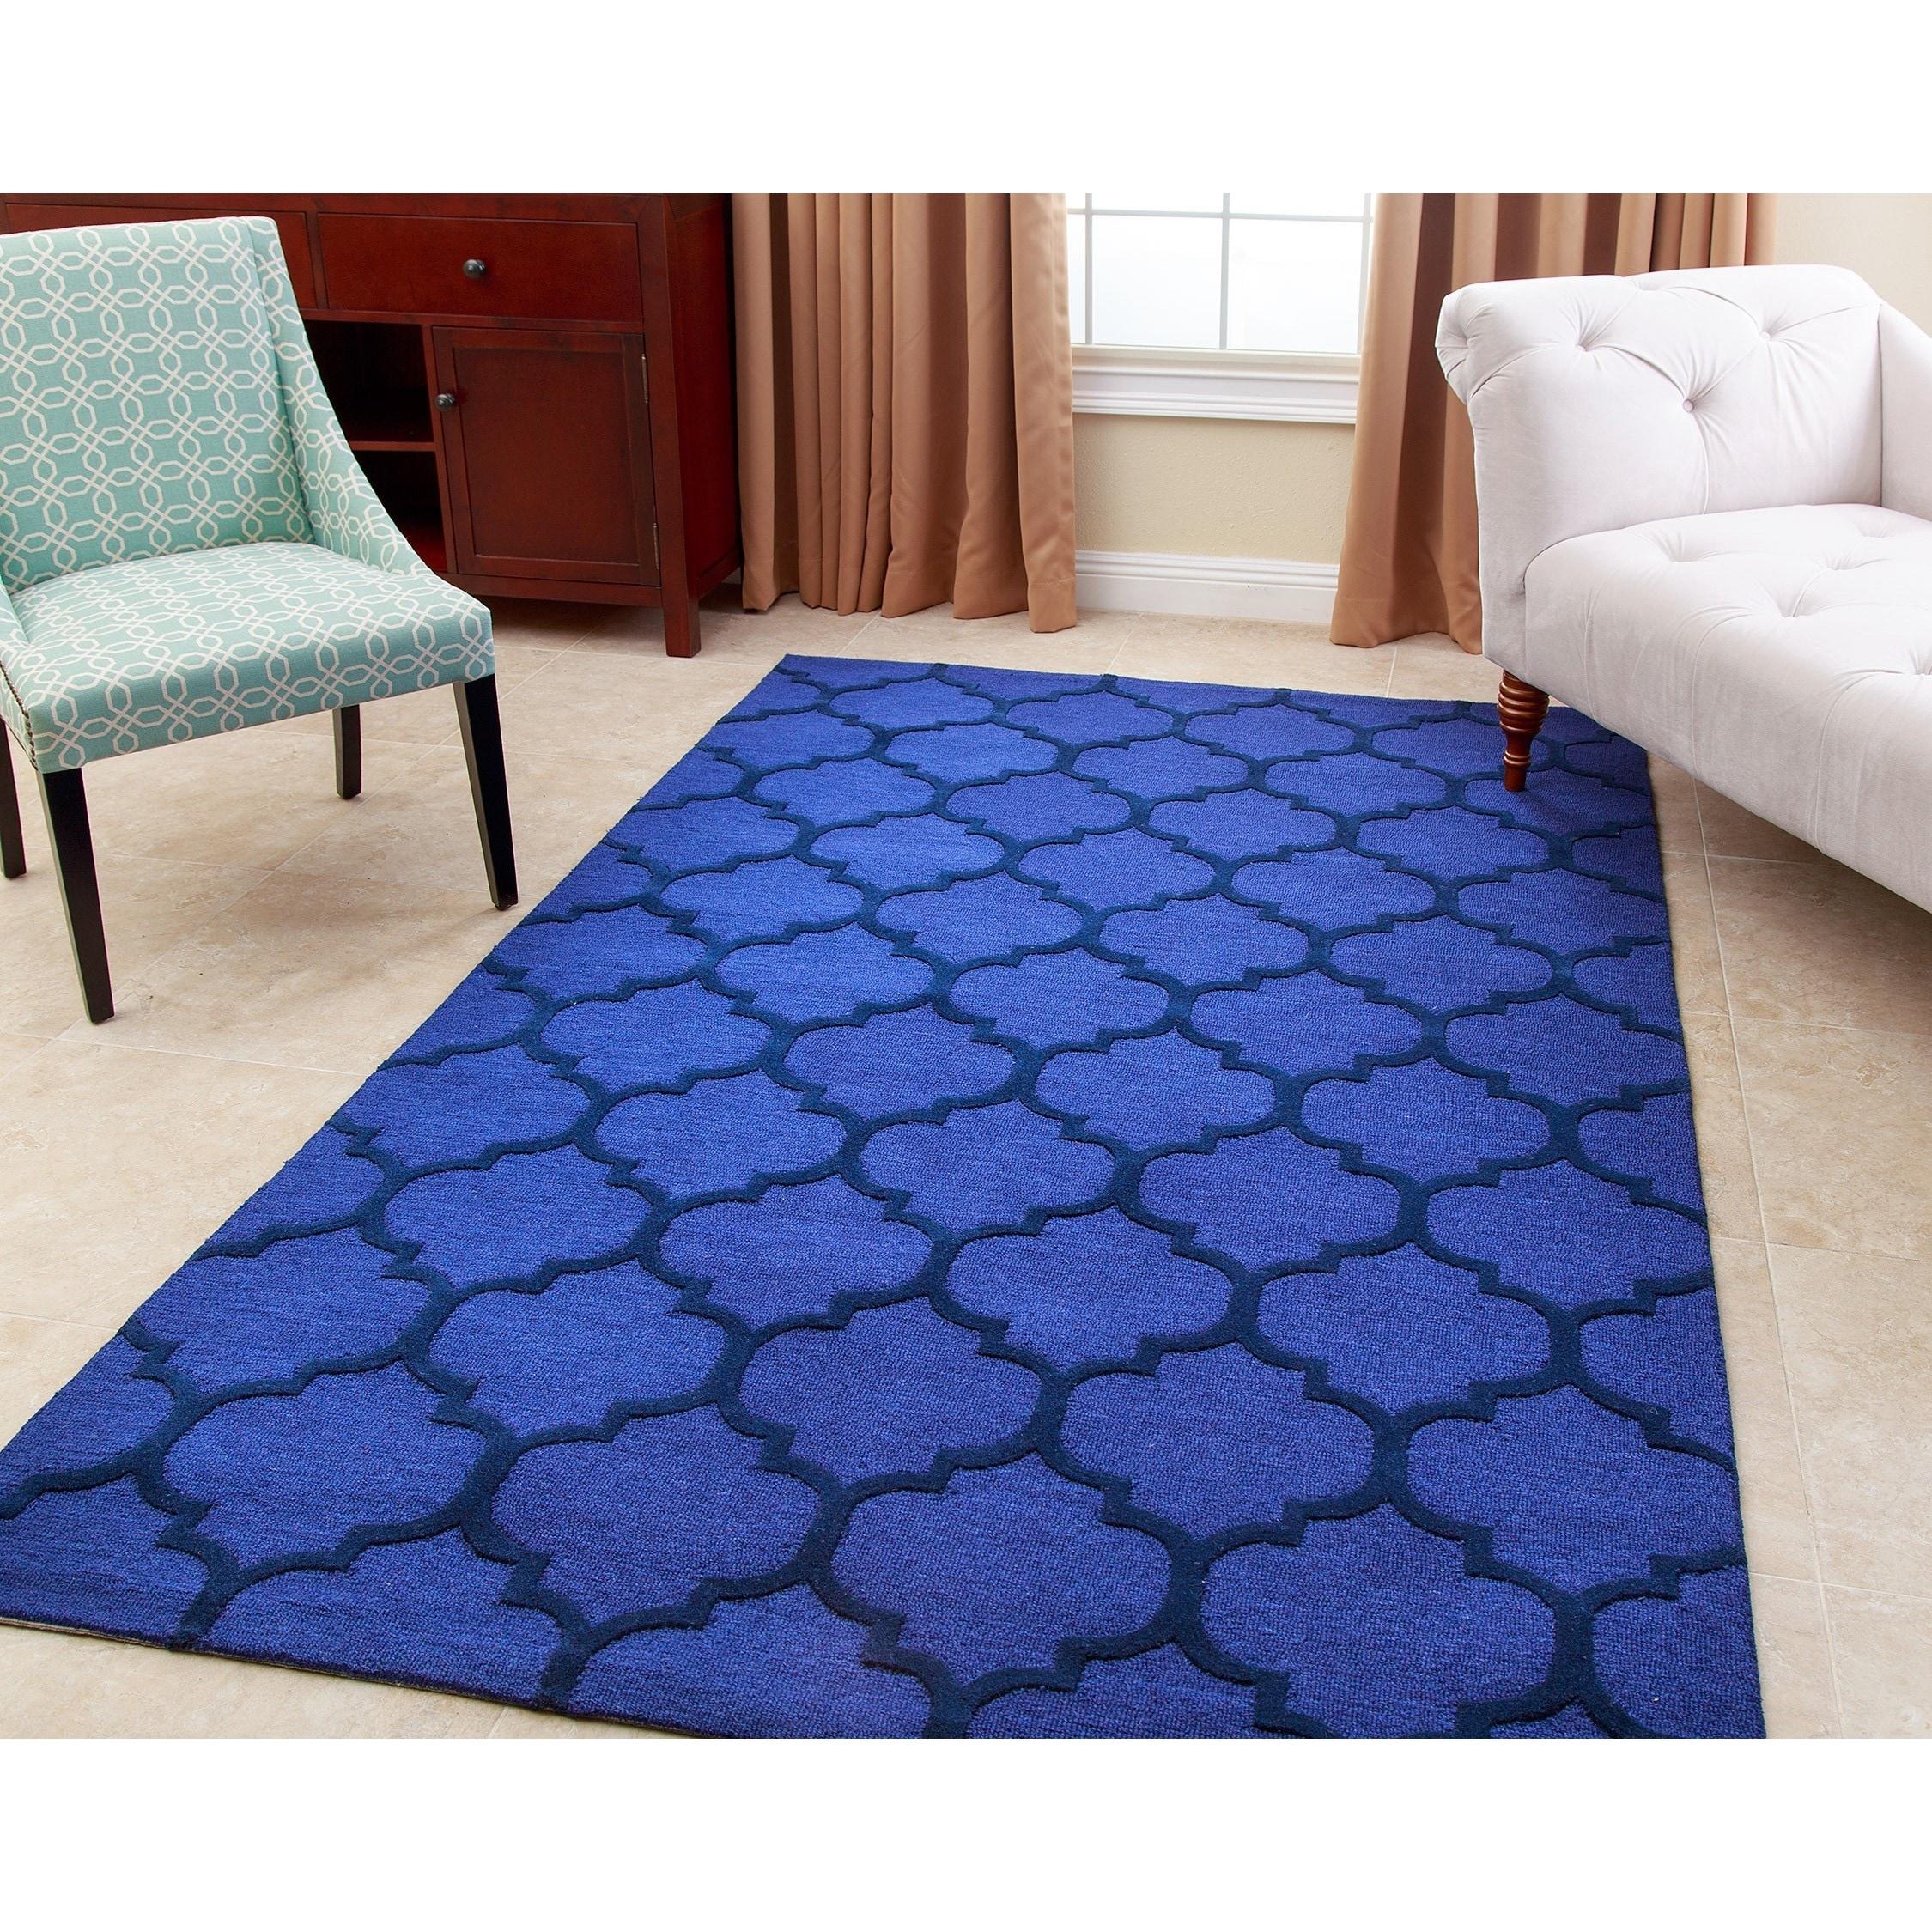 Abbyson Sebastian Sapphire Wool Rug (5' x 8') (Cerulean B...